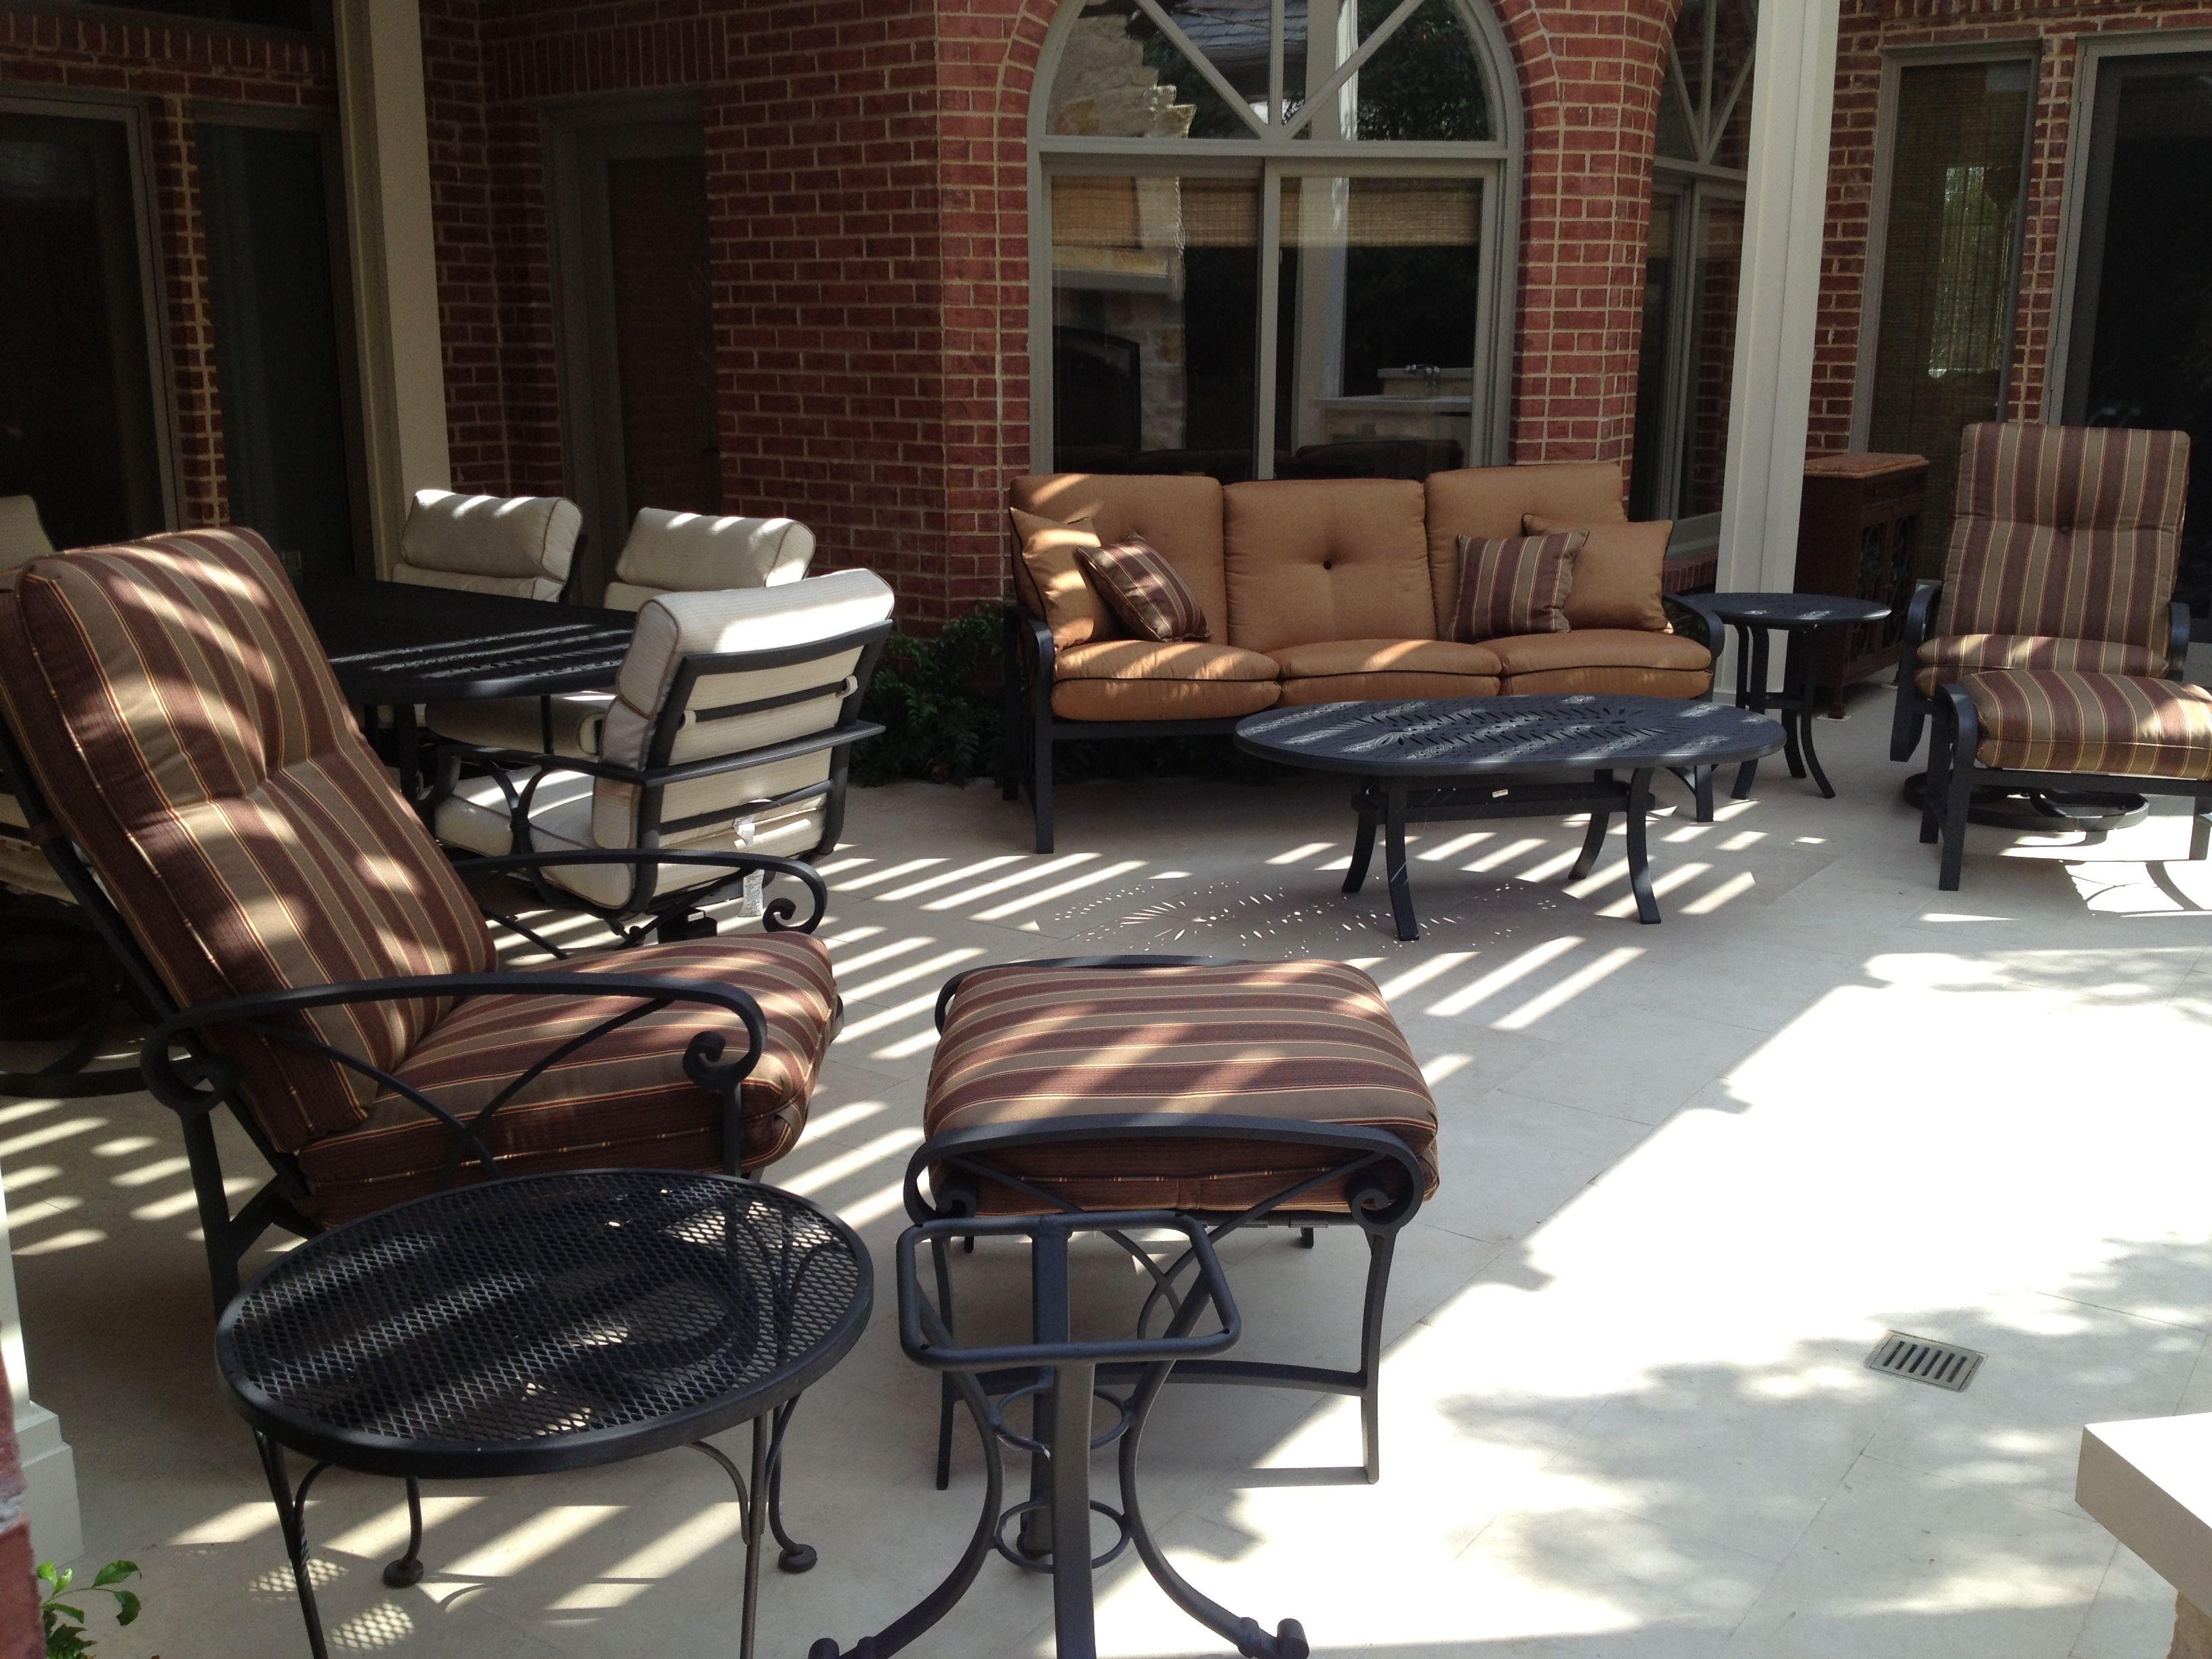 winston outdoor furniture in dallas perfect patios in north texas